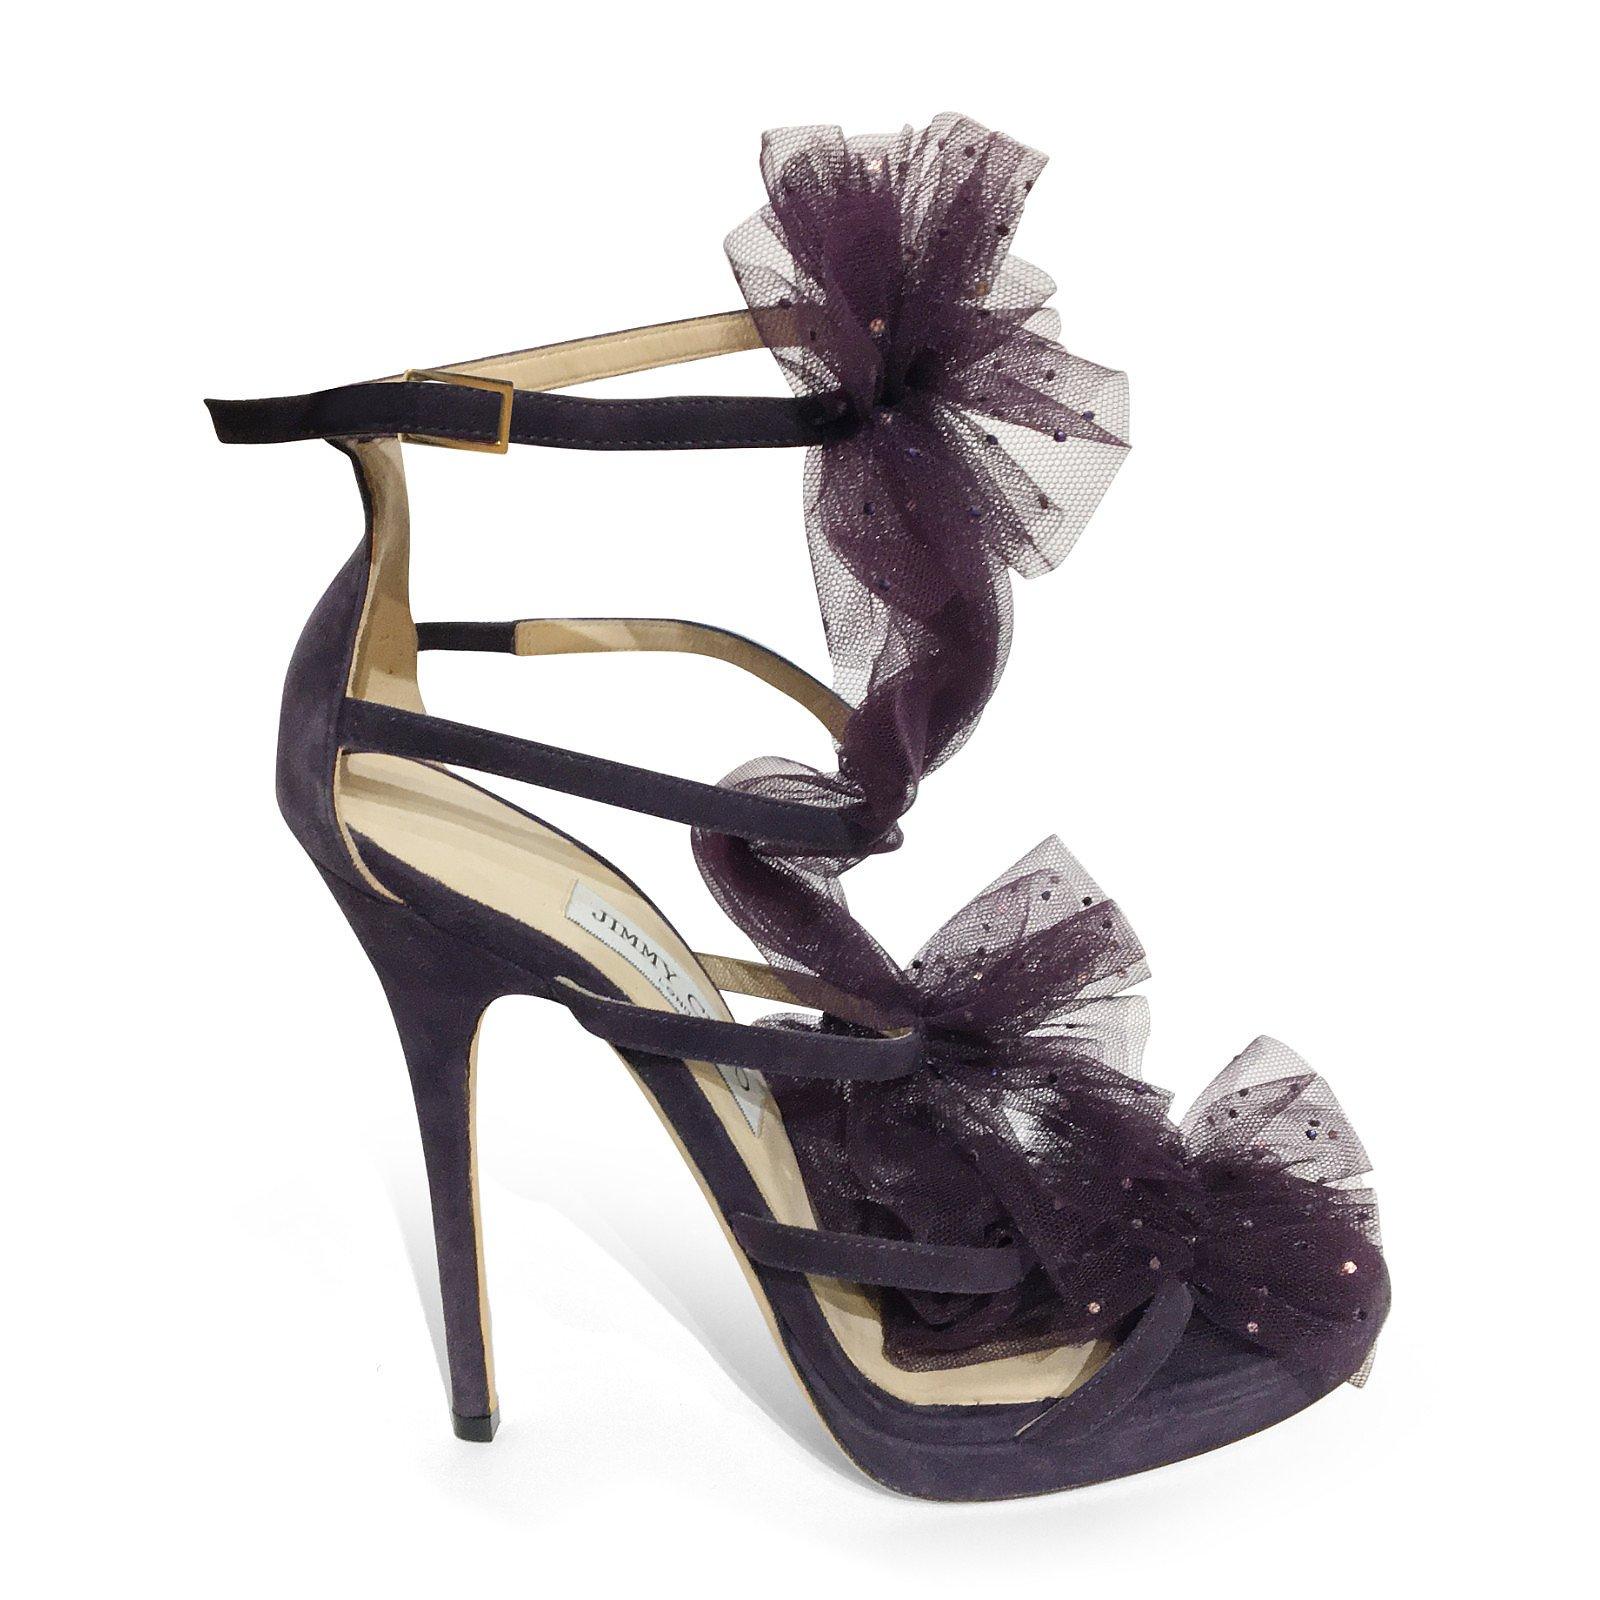 Jimmy Choo Floresse 100 Sandals